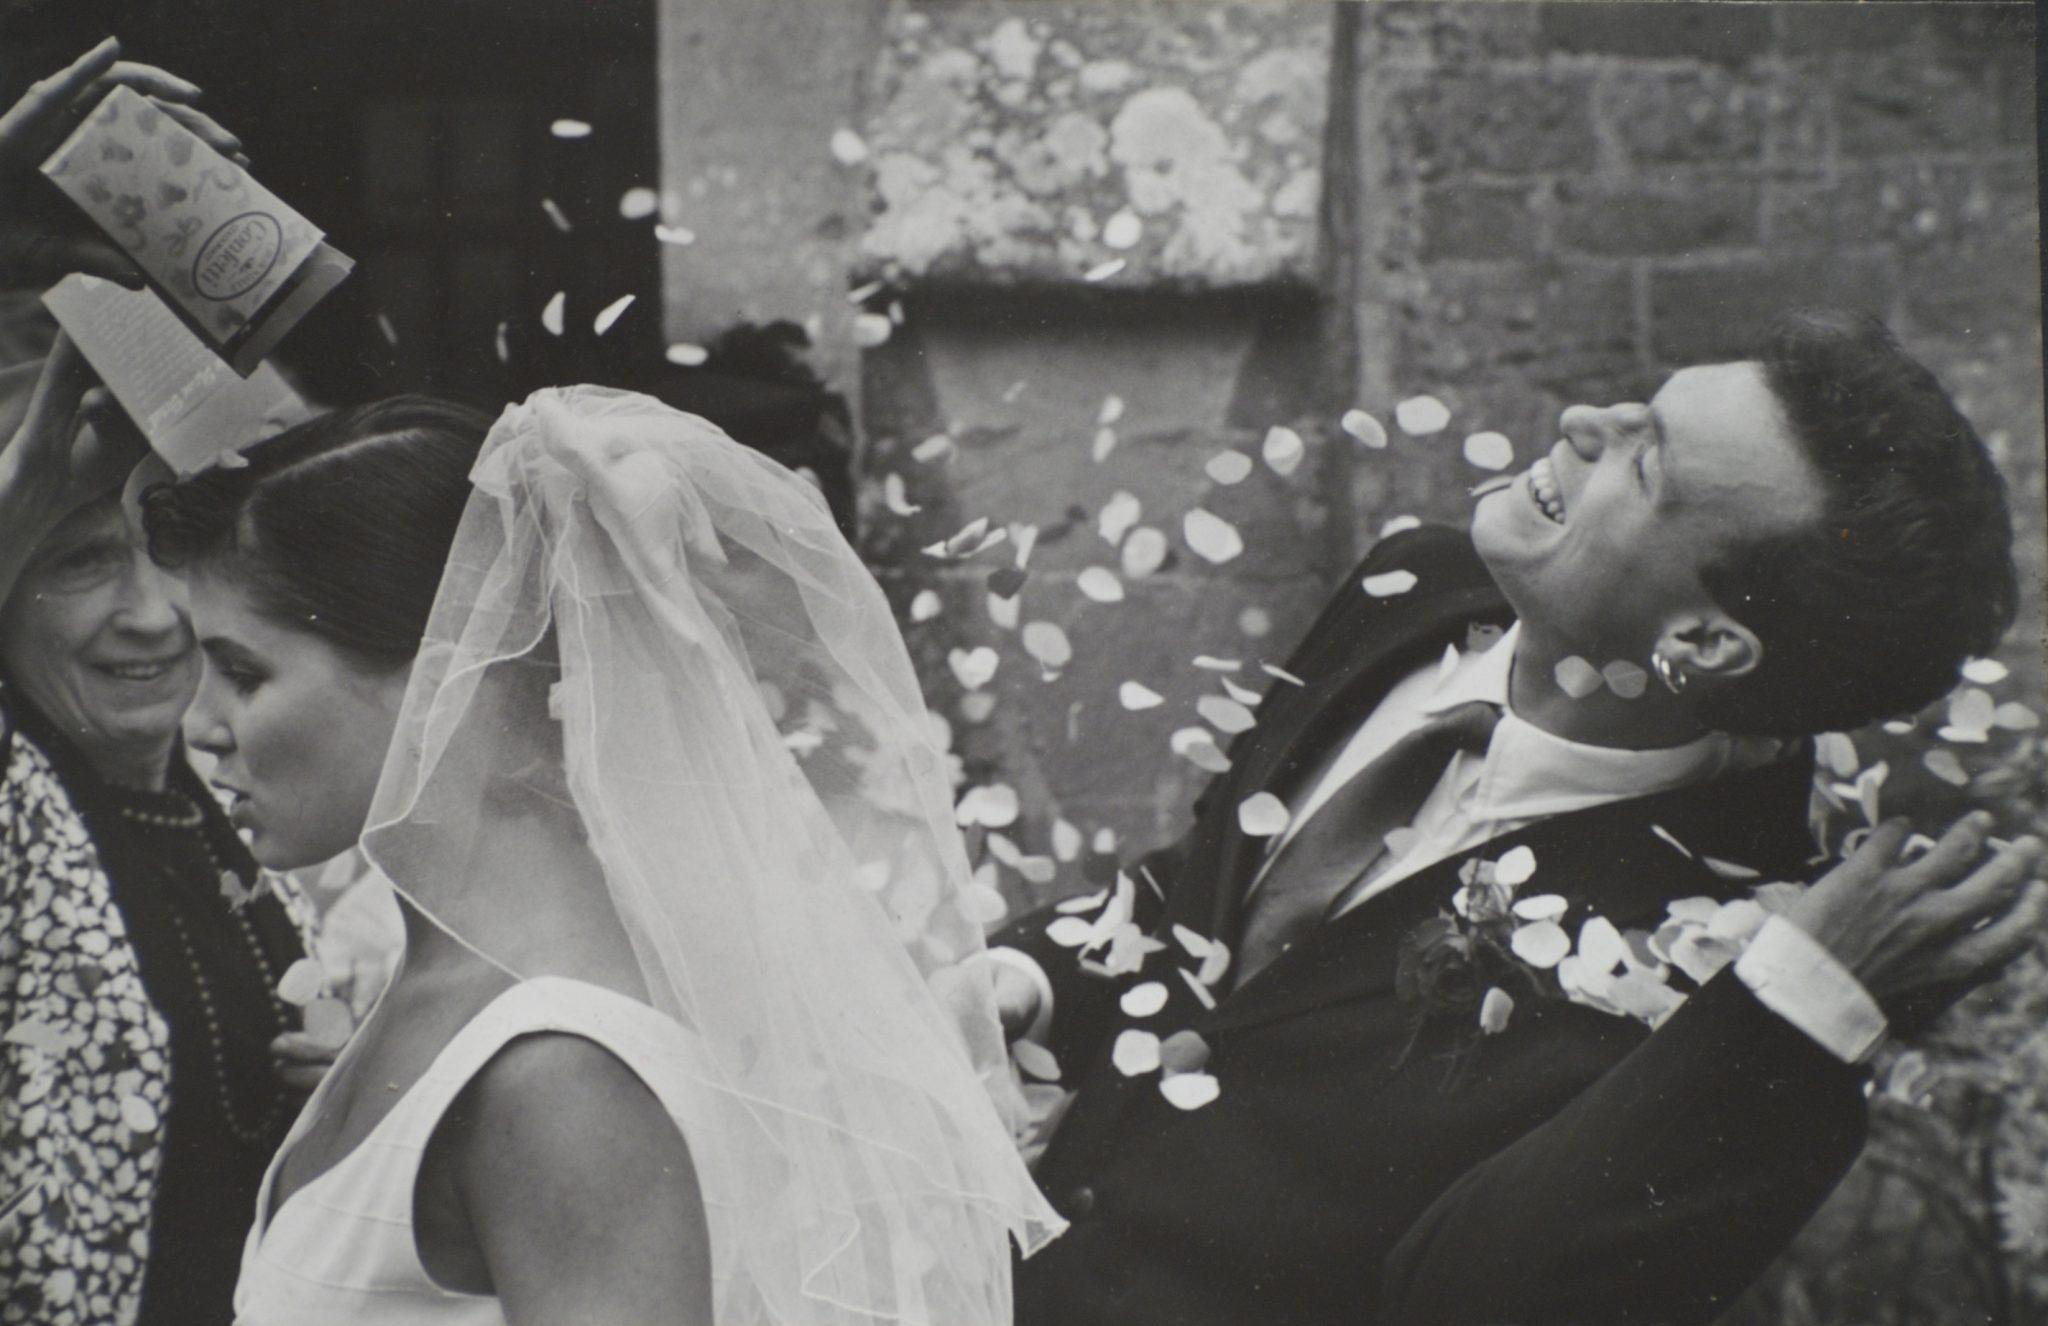 Wedding - Sadie Frost marries Gary Kemp, 1988 © Robert Davidson Photography